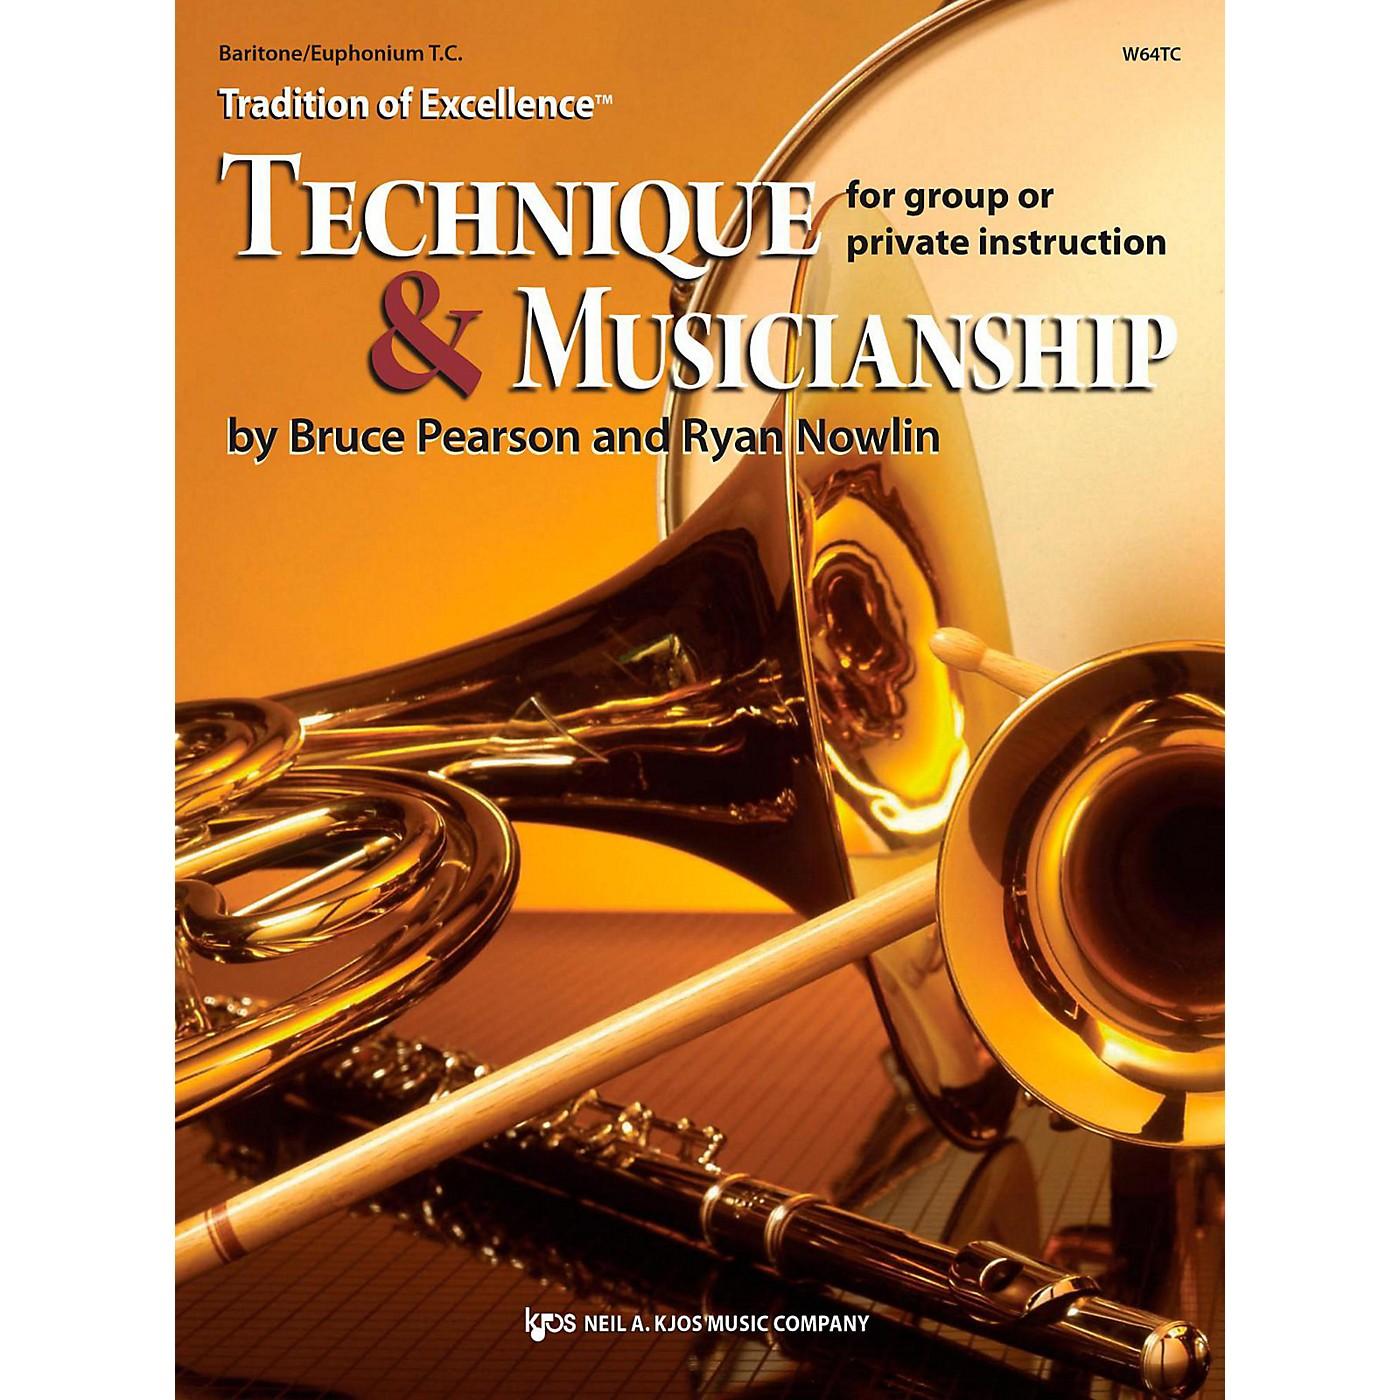 KJOS Tradition of Excellence: Technique & Musicianship Baritone/Euph Tc thumbnail